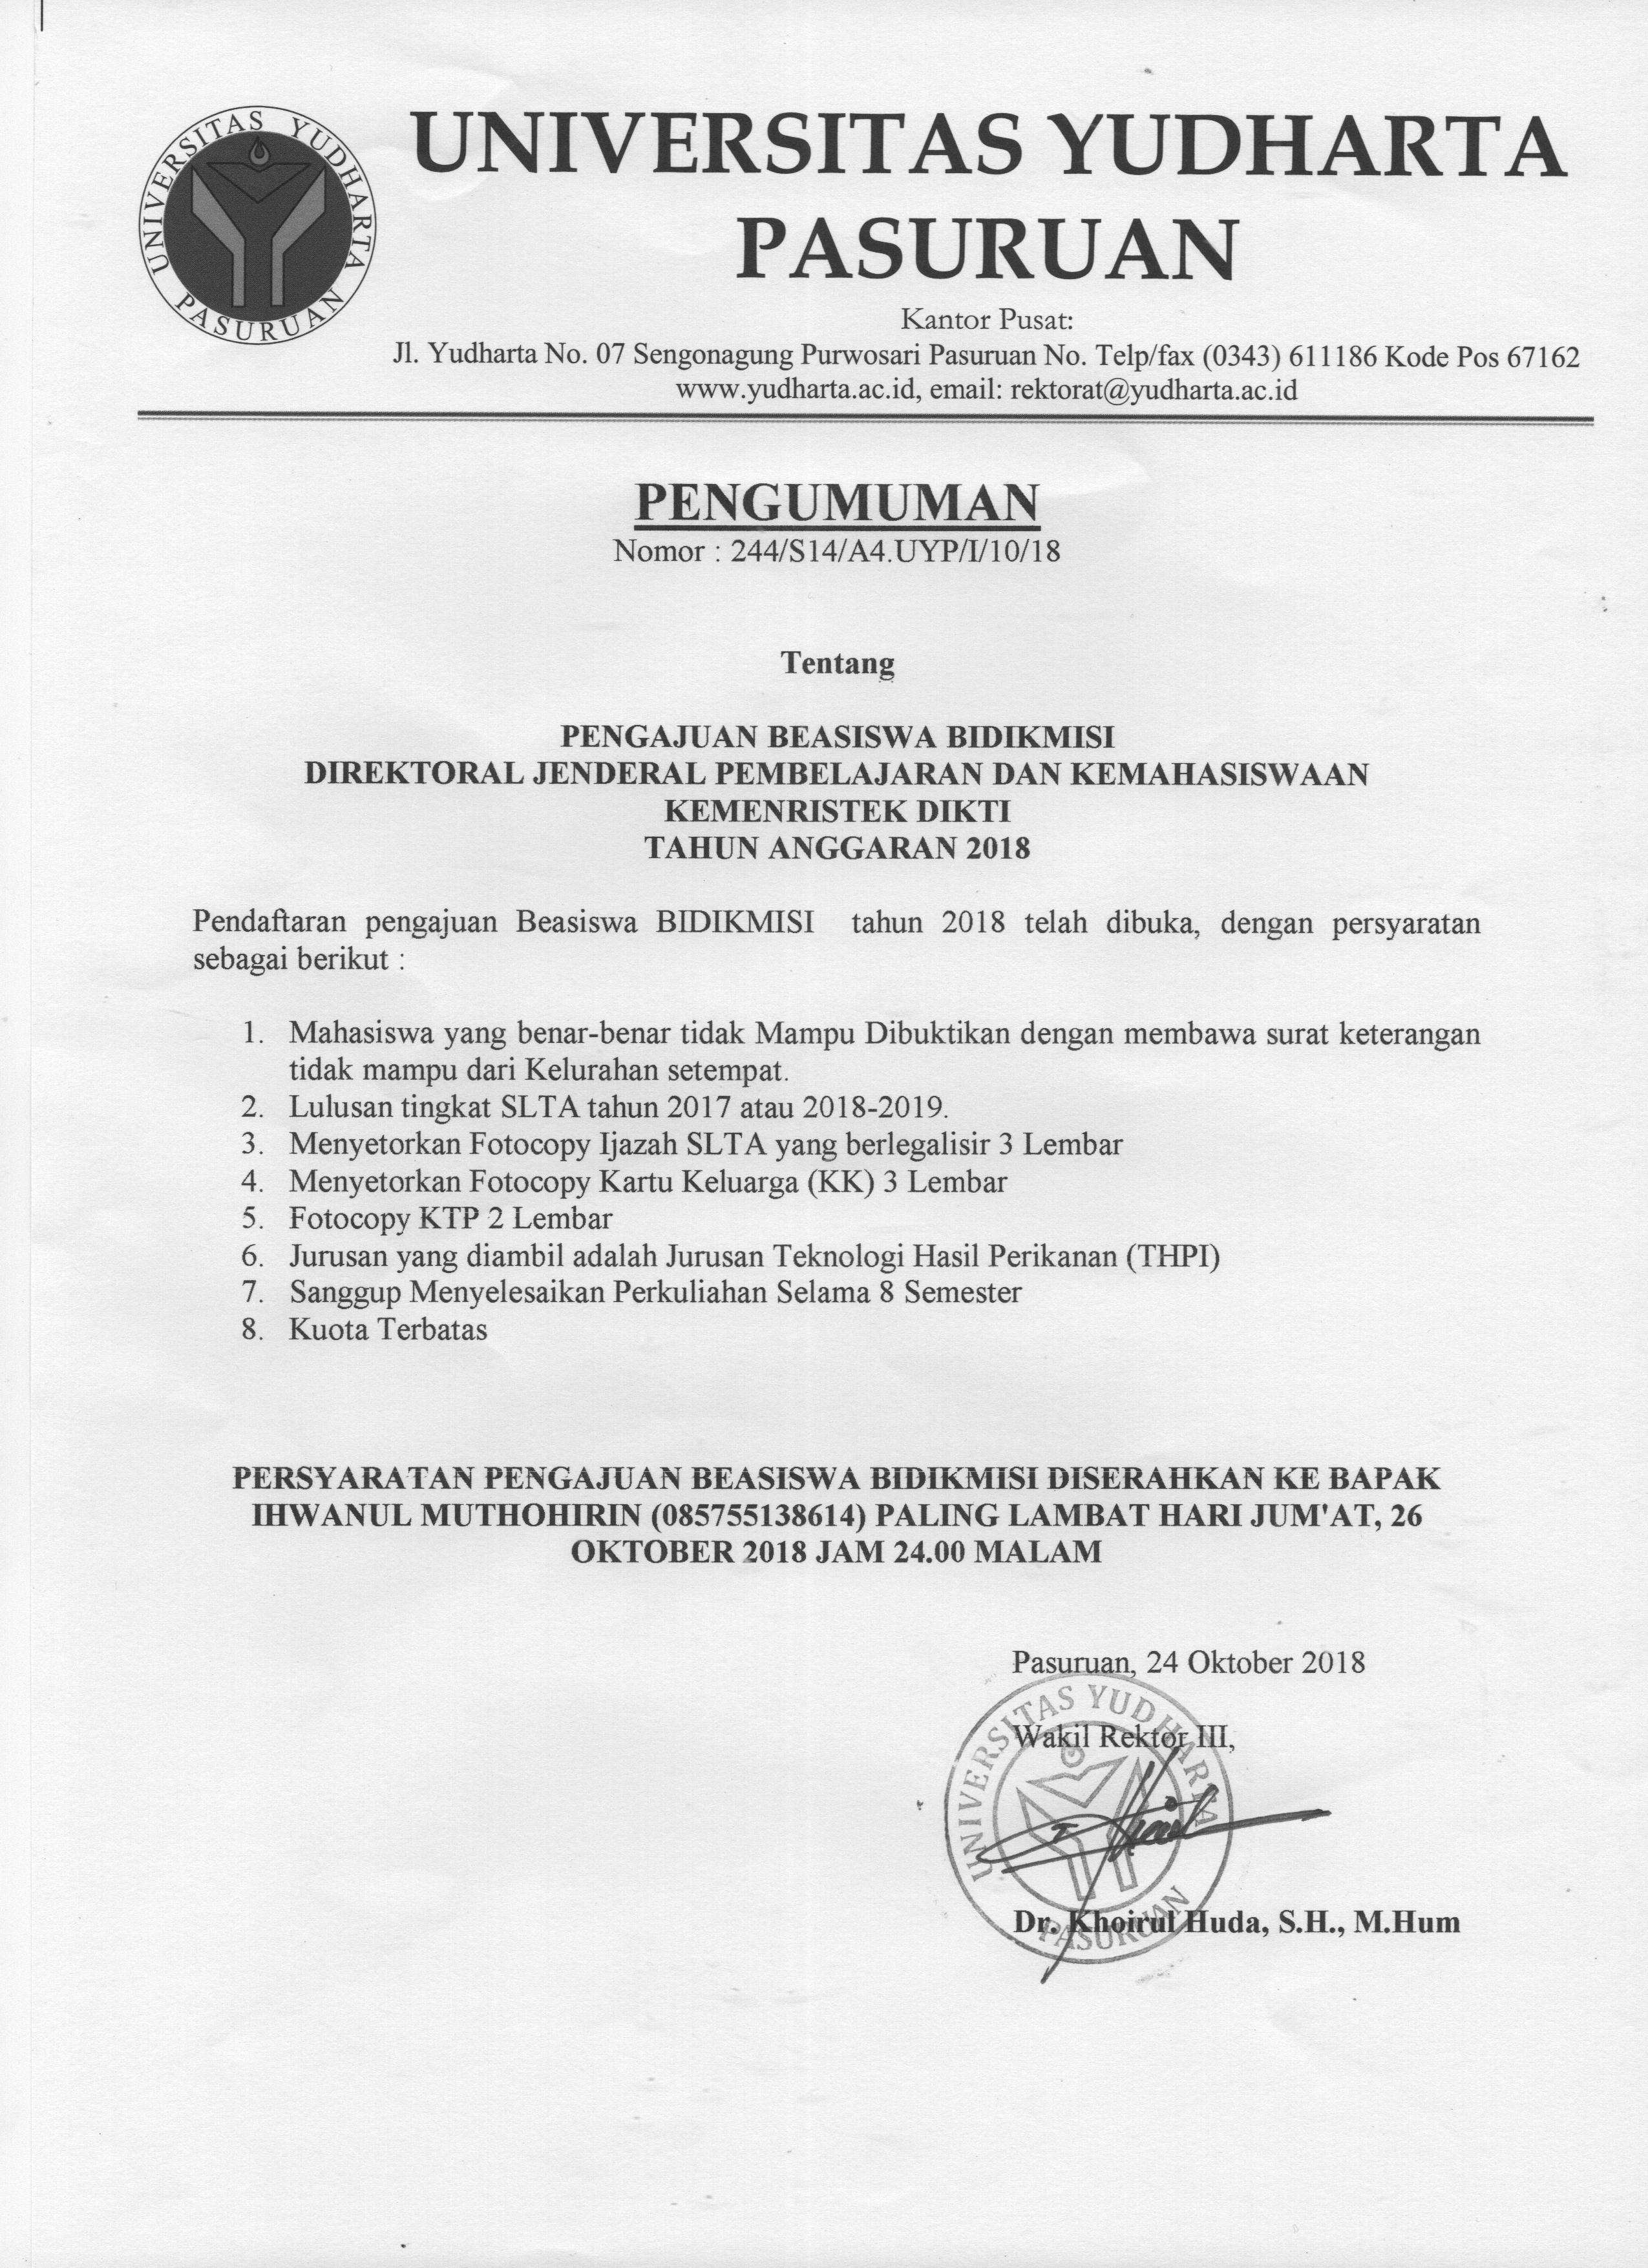 Pengajuan Beasiswa Bidikmisi 2018 Universitas Yudharta